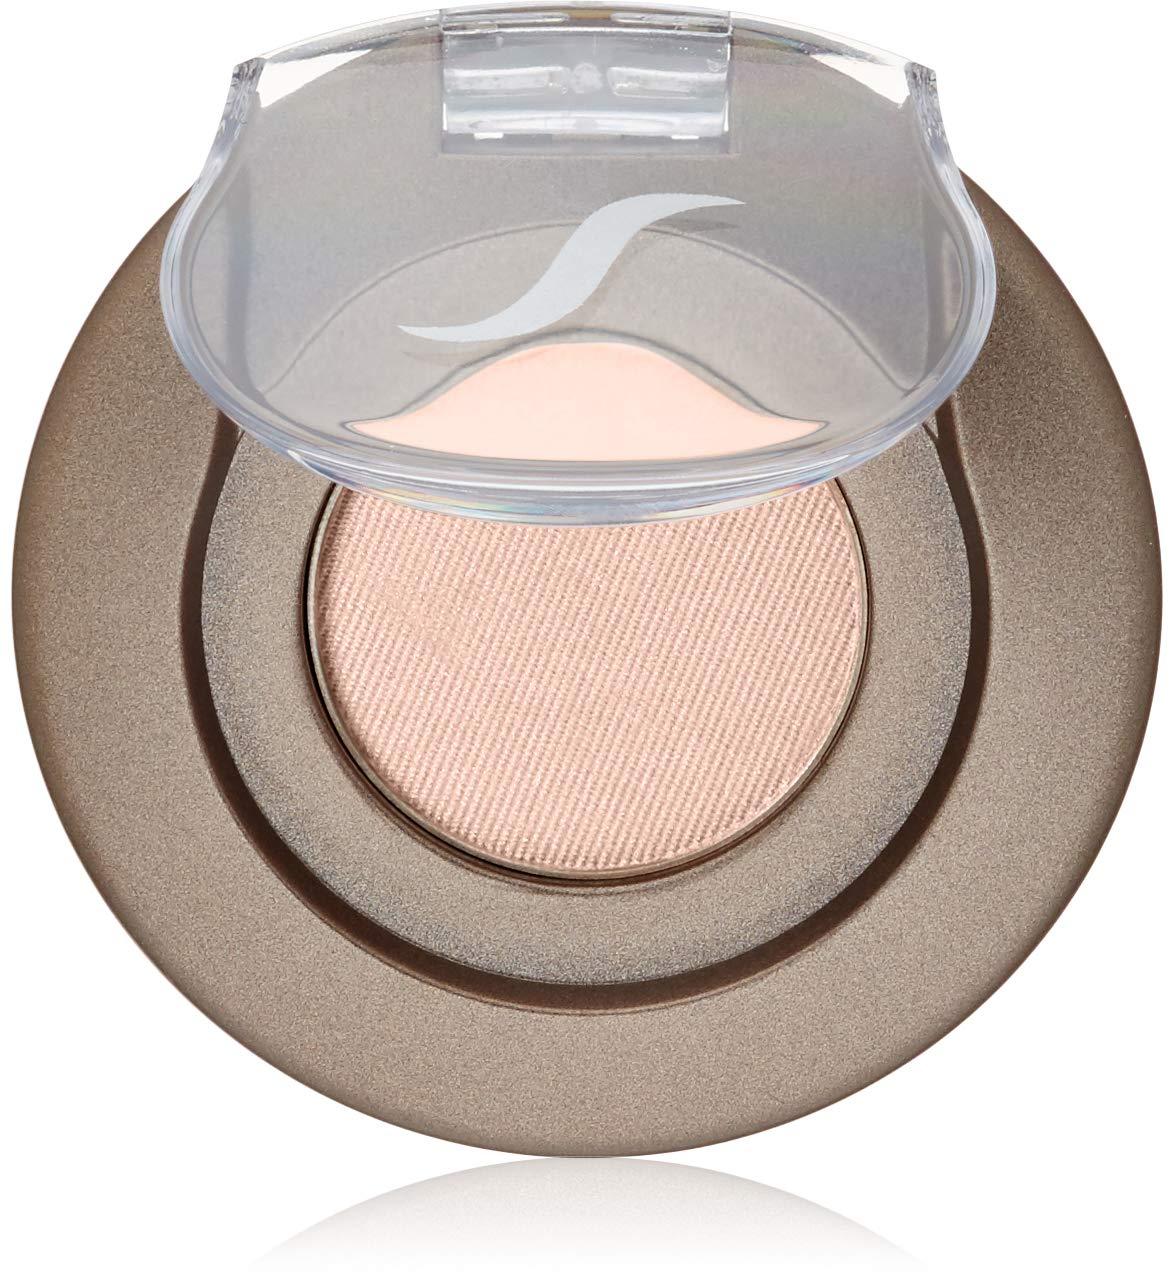 Sorme' Treatment Cosmetics Mineral Botanicals Eye Shadow, Peace